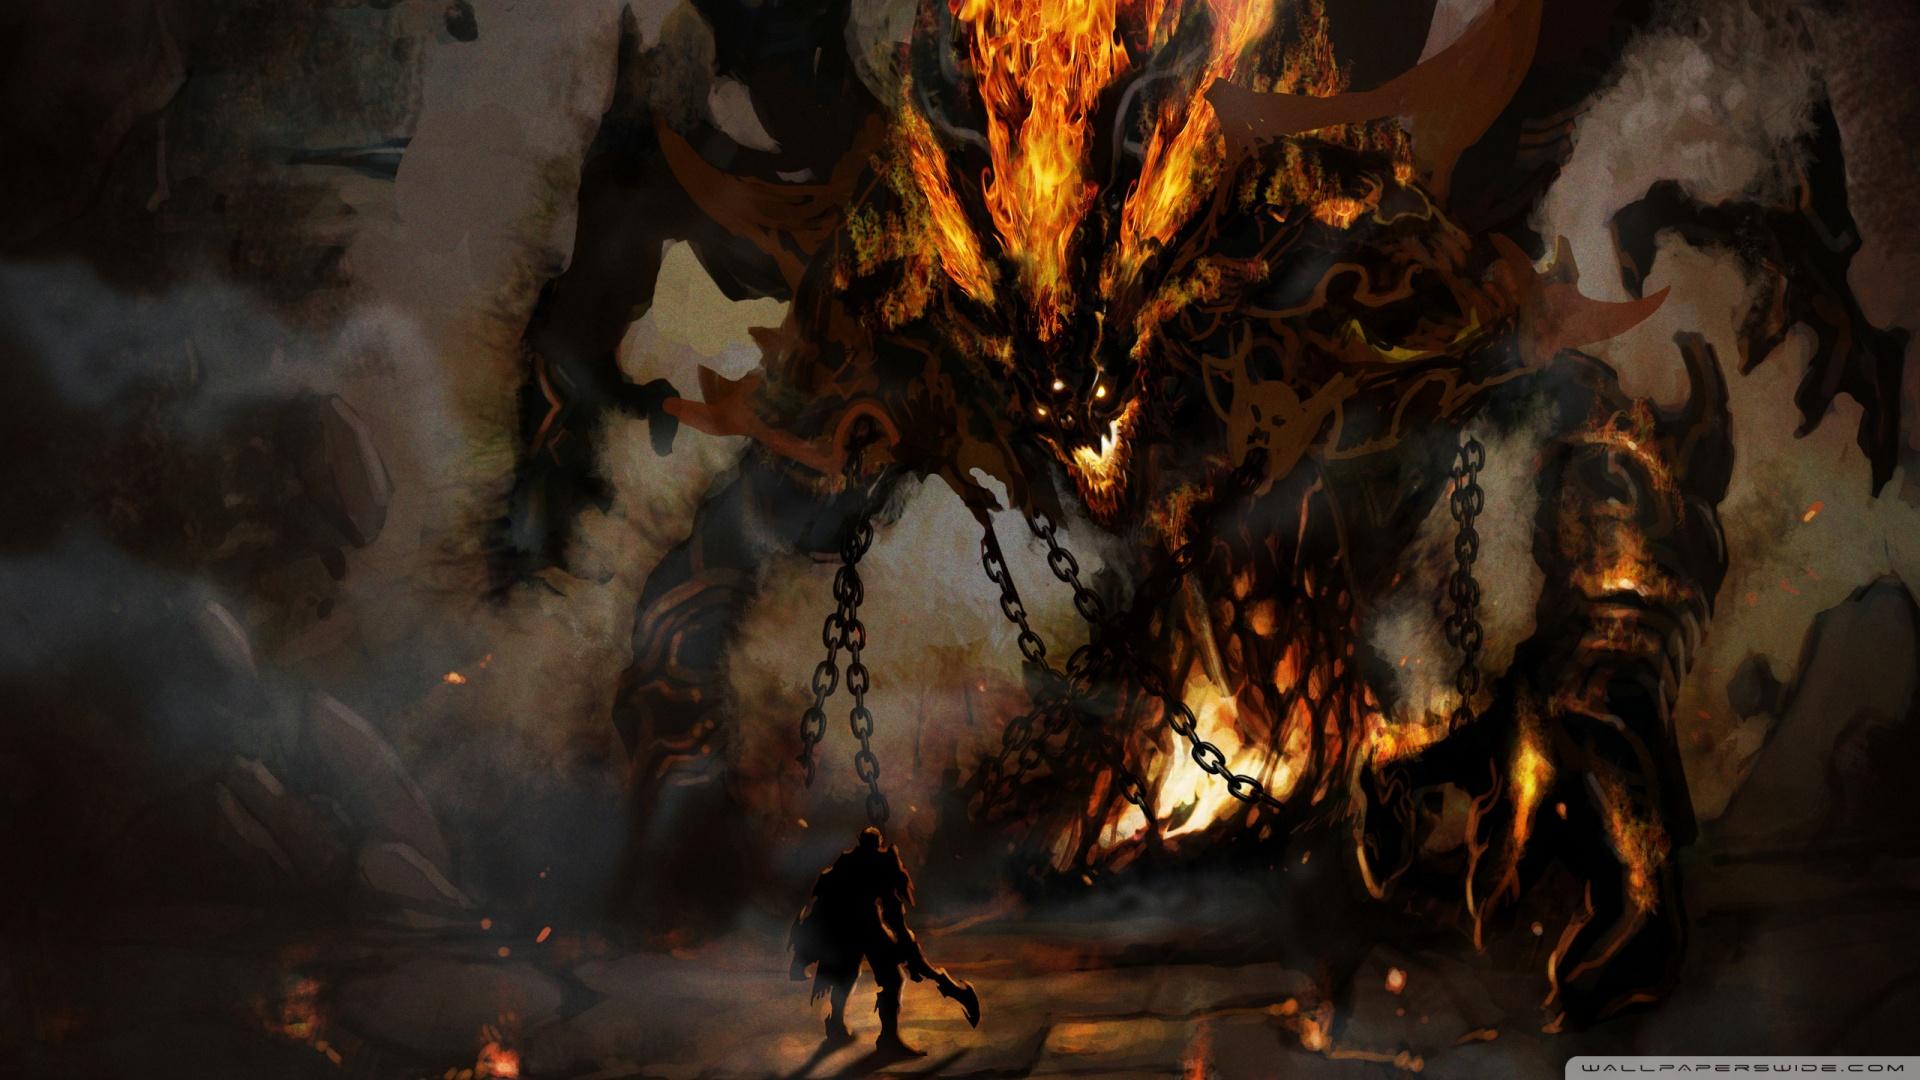 Download Fire Demon Wallpaper 1920x1080 Wallpoper 449563 1920x1080